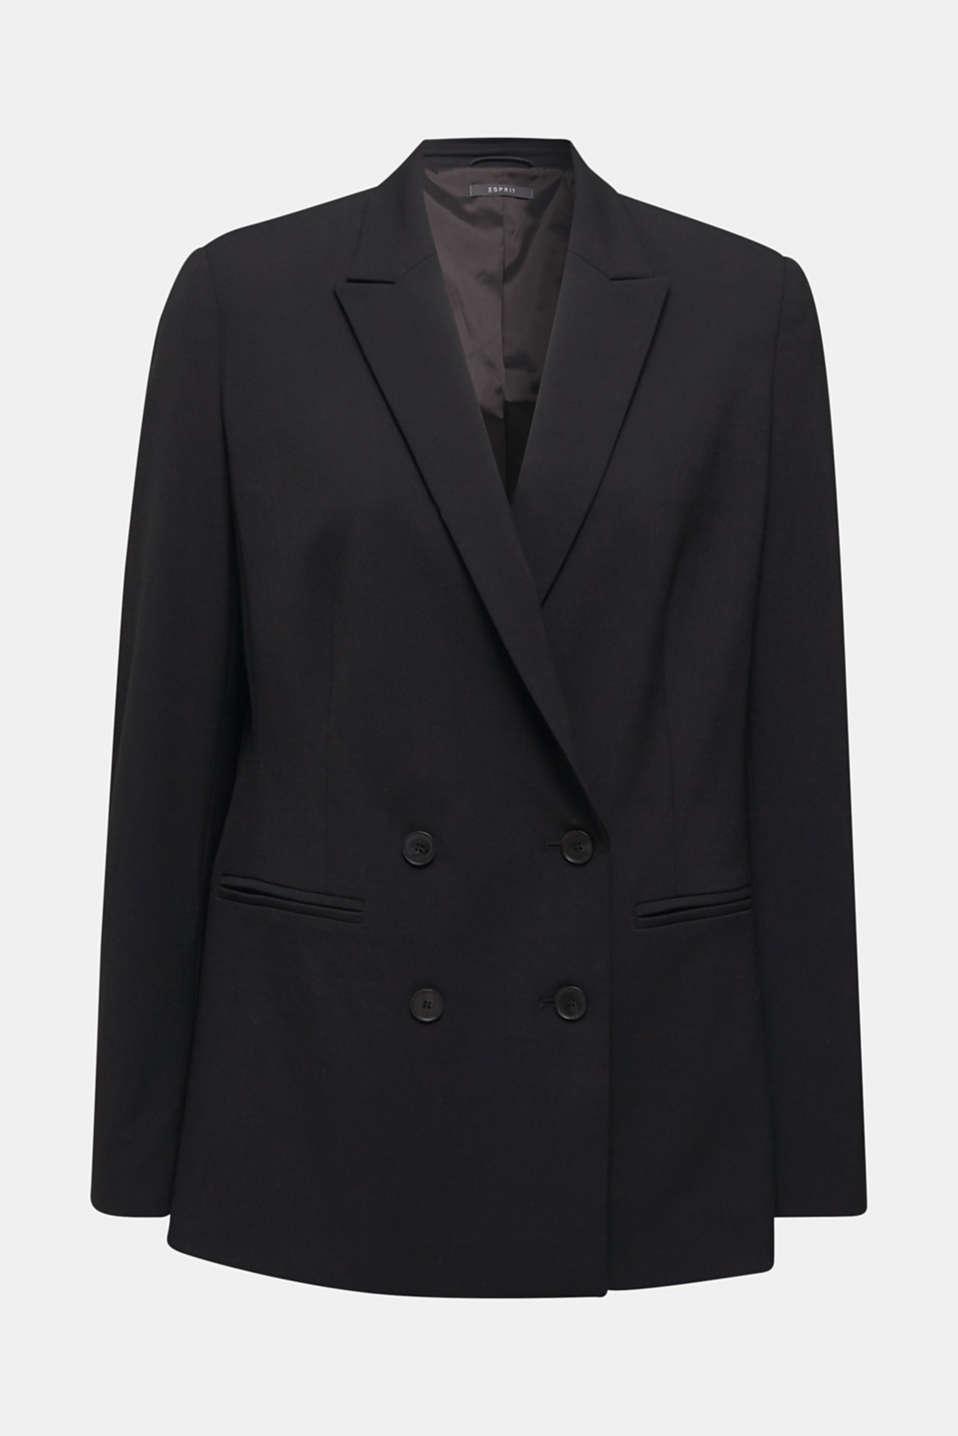 STRETCH FABRIC Mix + Match stretch blazer, BLACK, detail image number 5